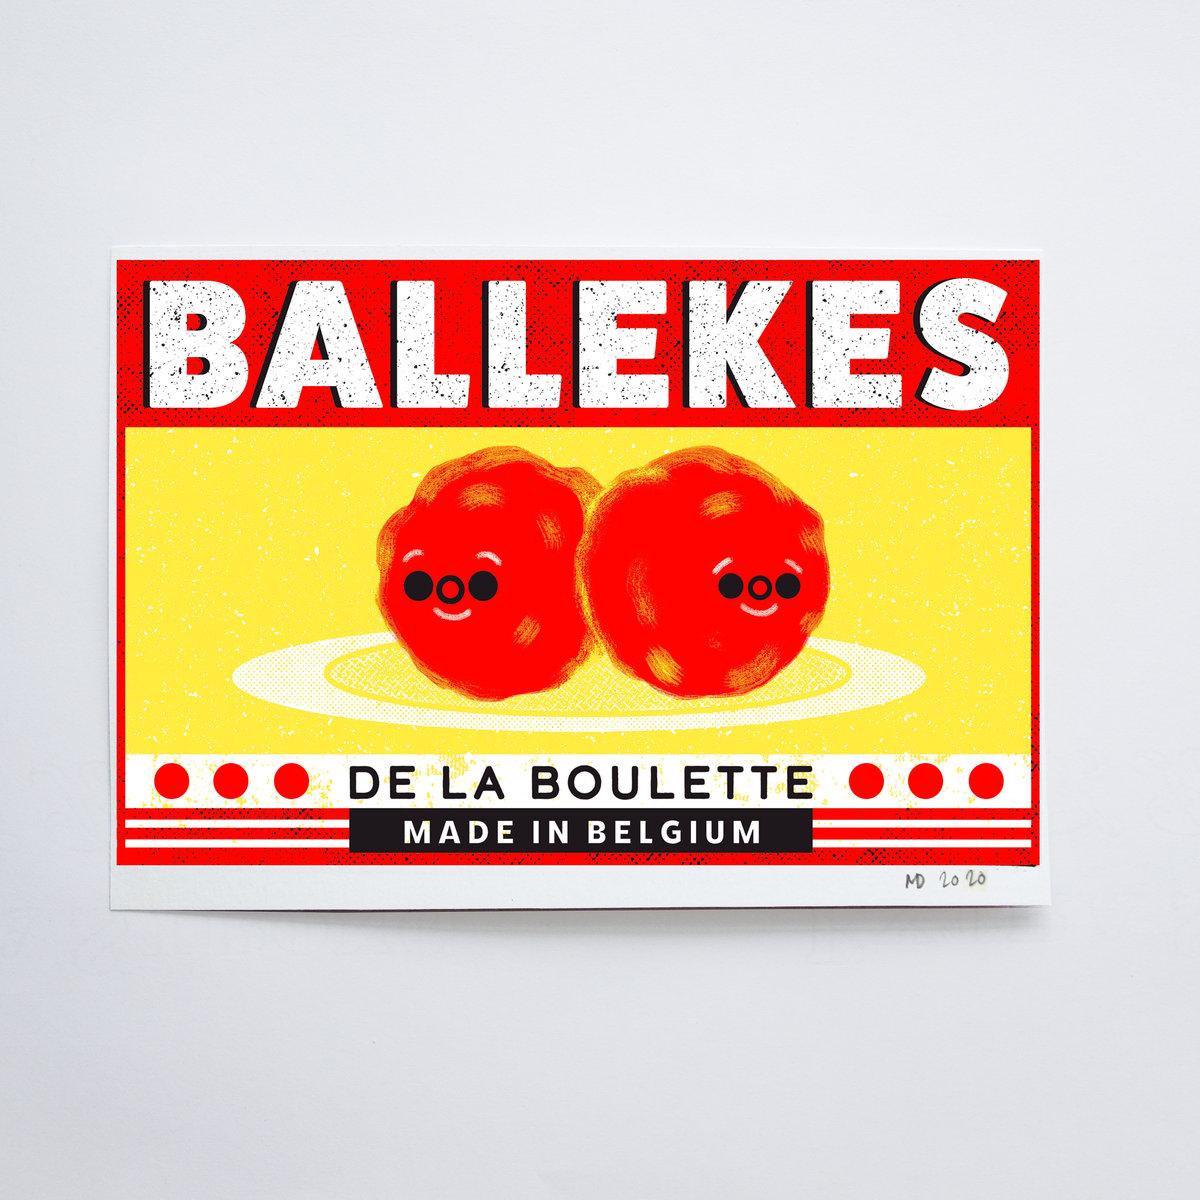 Mini Lard / Peket / Baraki / Ballekes / Gaufre de Liège